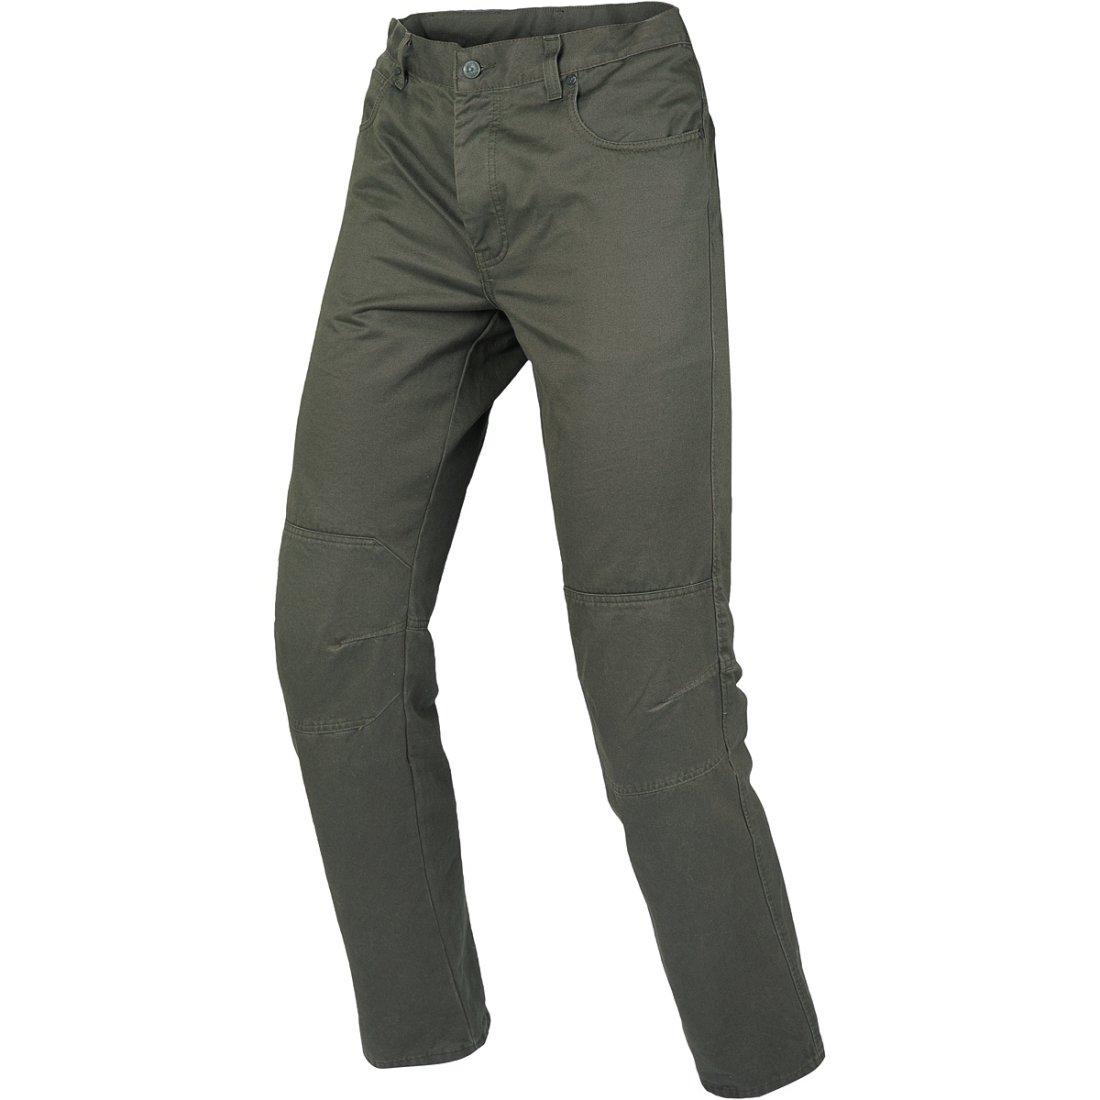 042f7261248 318 Pantalones para moto de carretera · Motocard